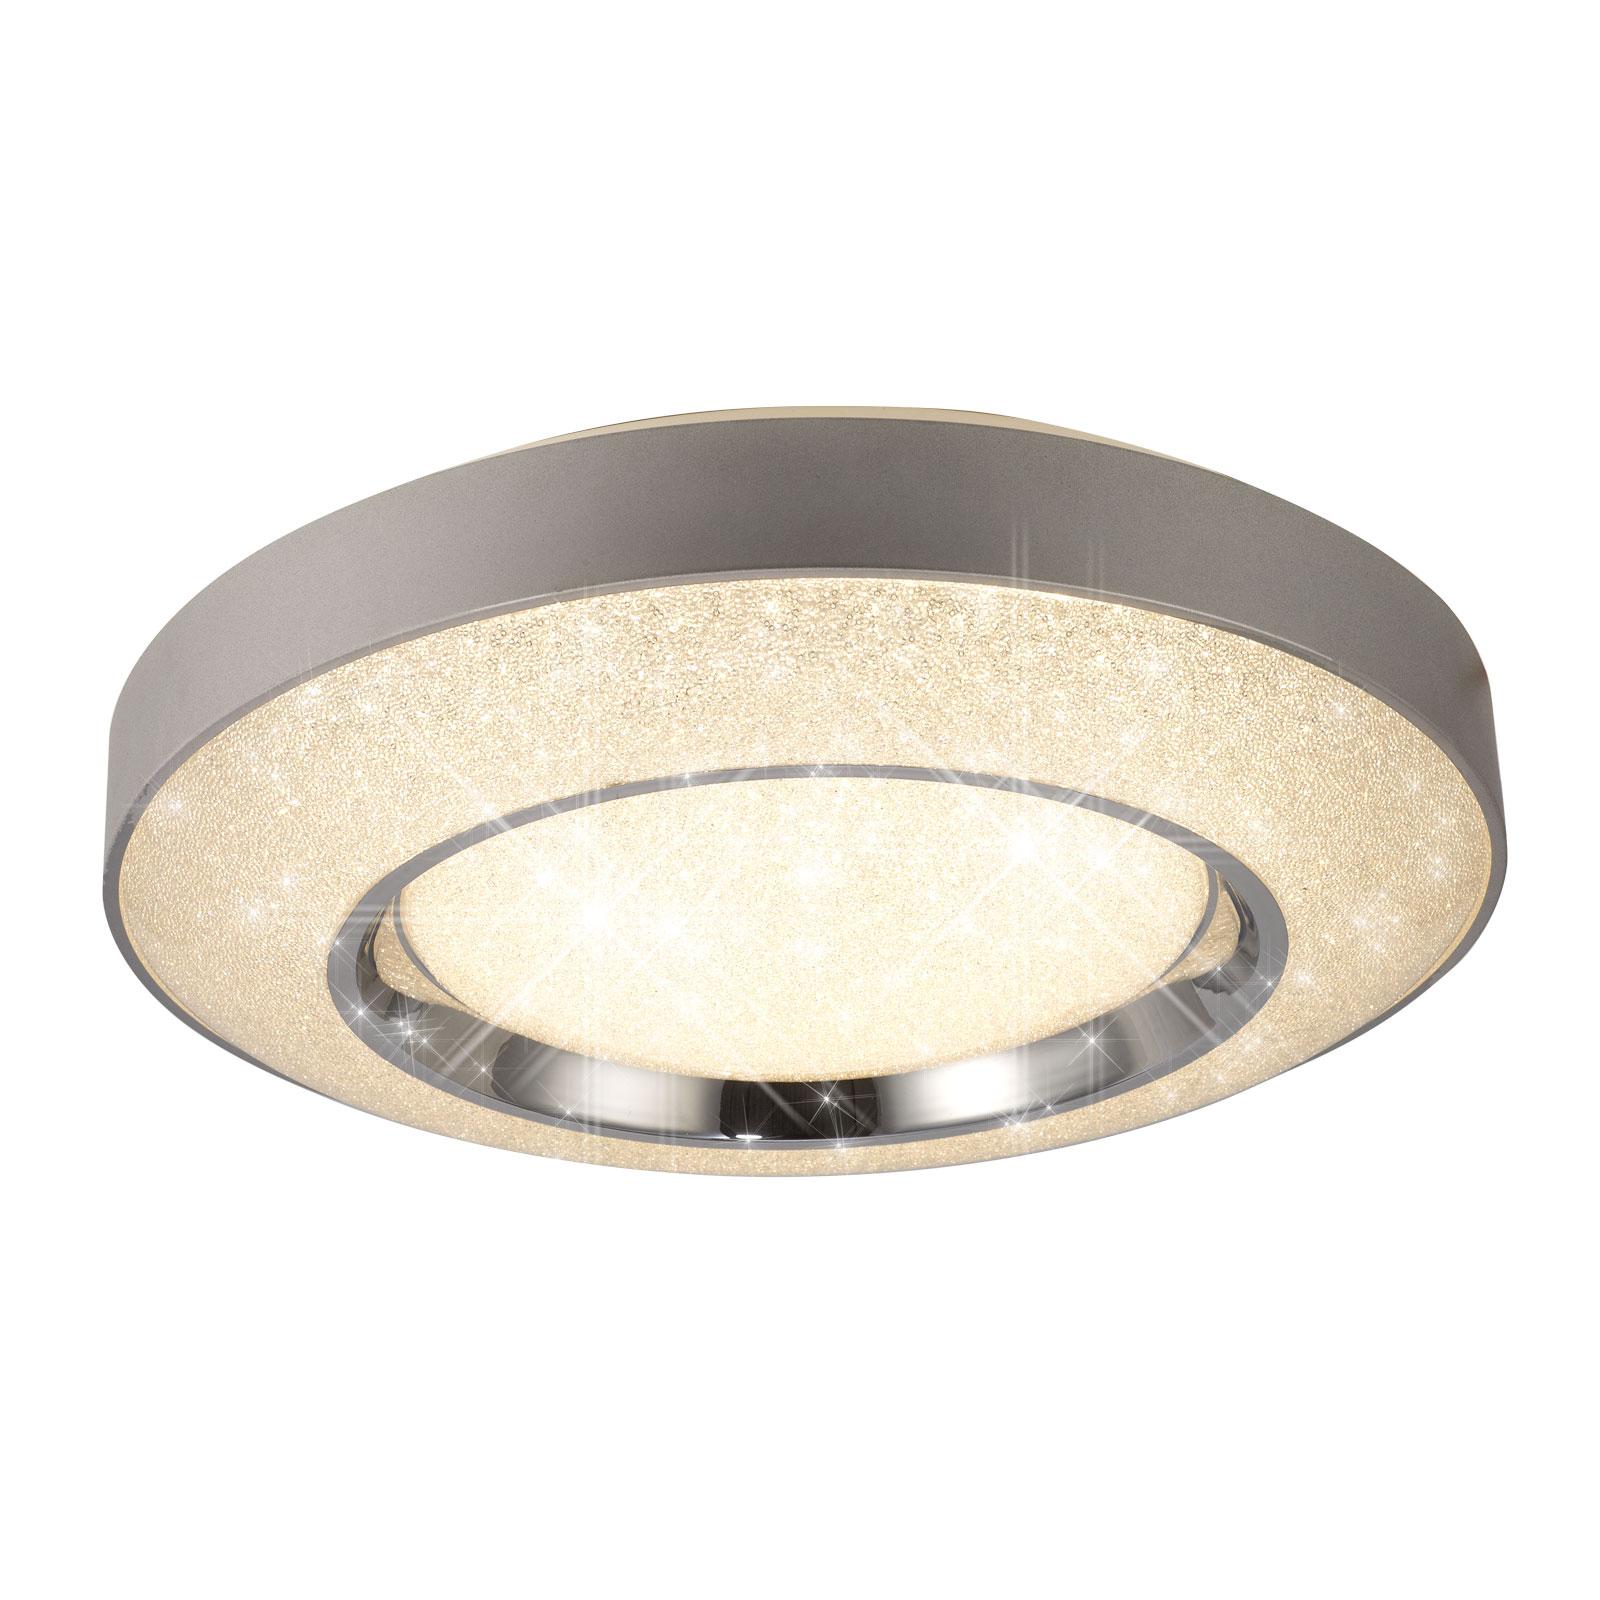 Lampa sufitowa LED Santorini z pilotem Ø52 cm